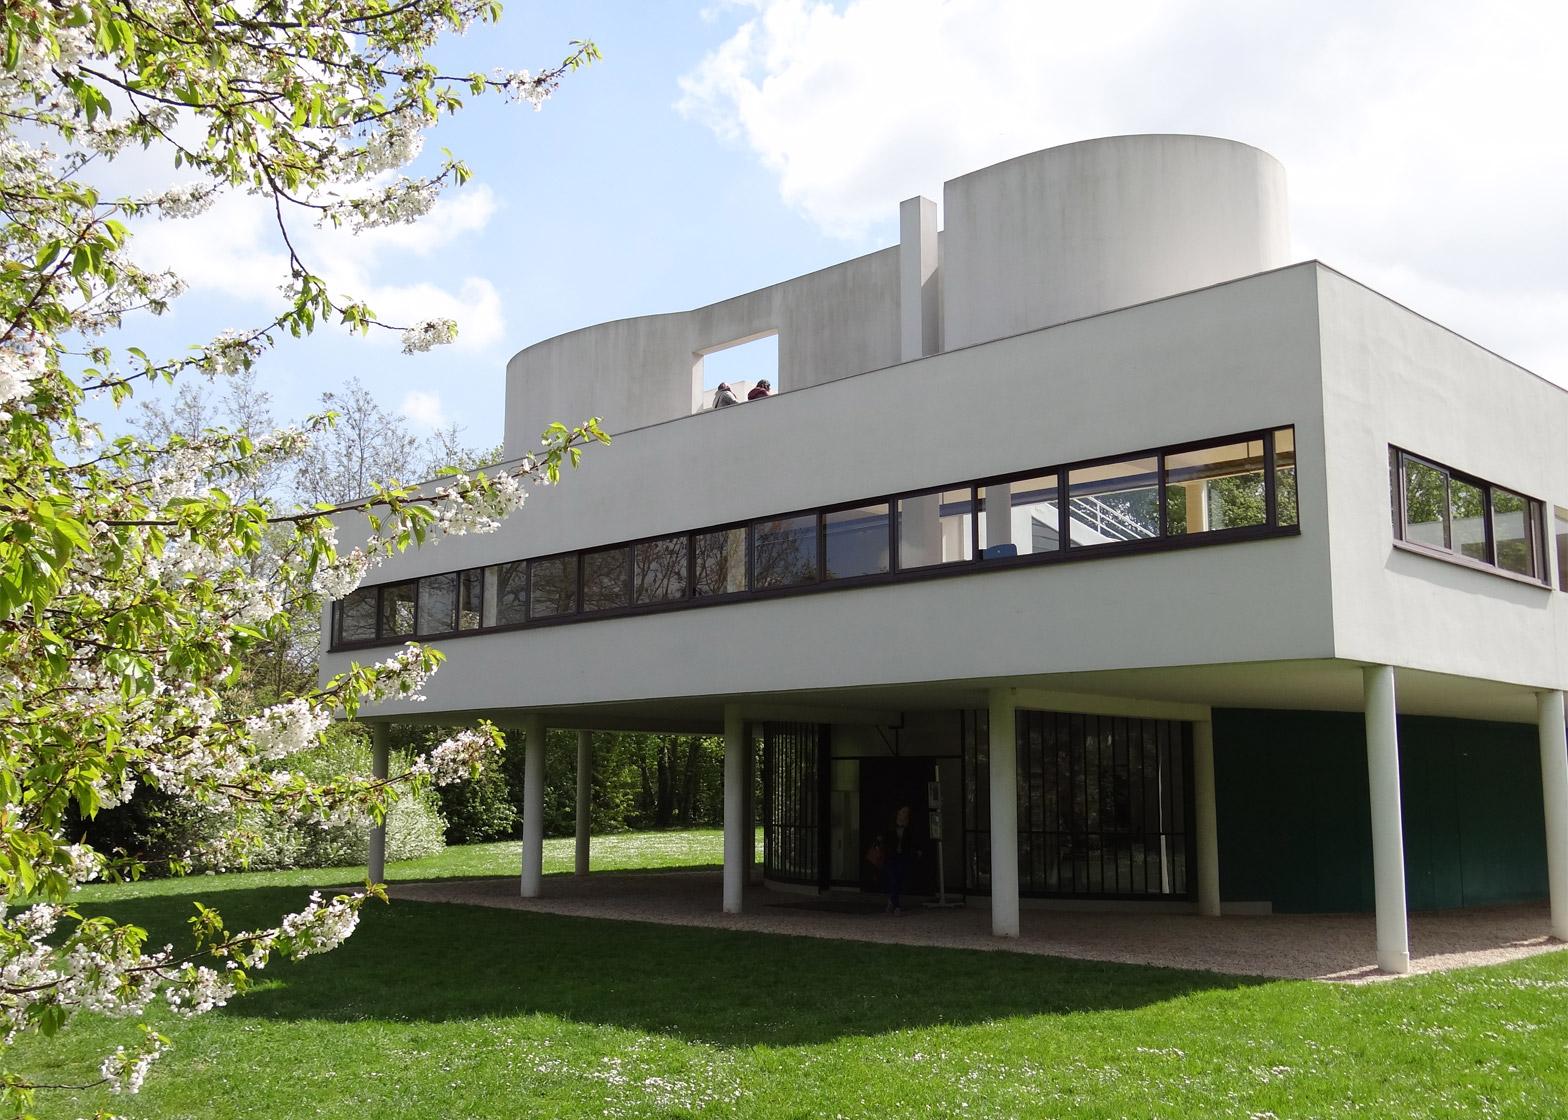 Villa Savoye et loge du jardinier, Poissy, France, 1928